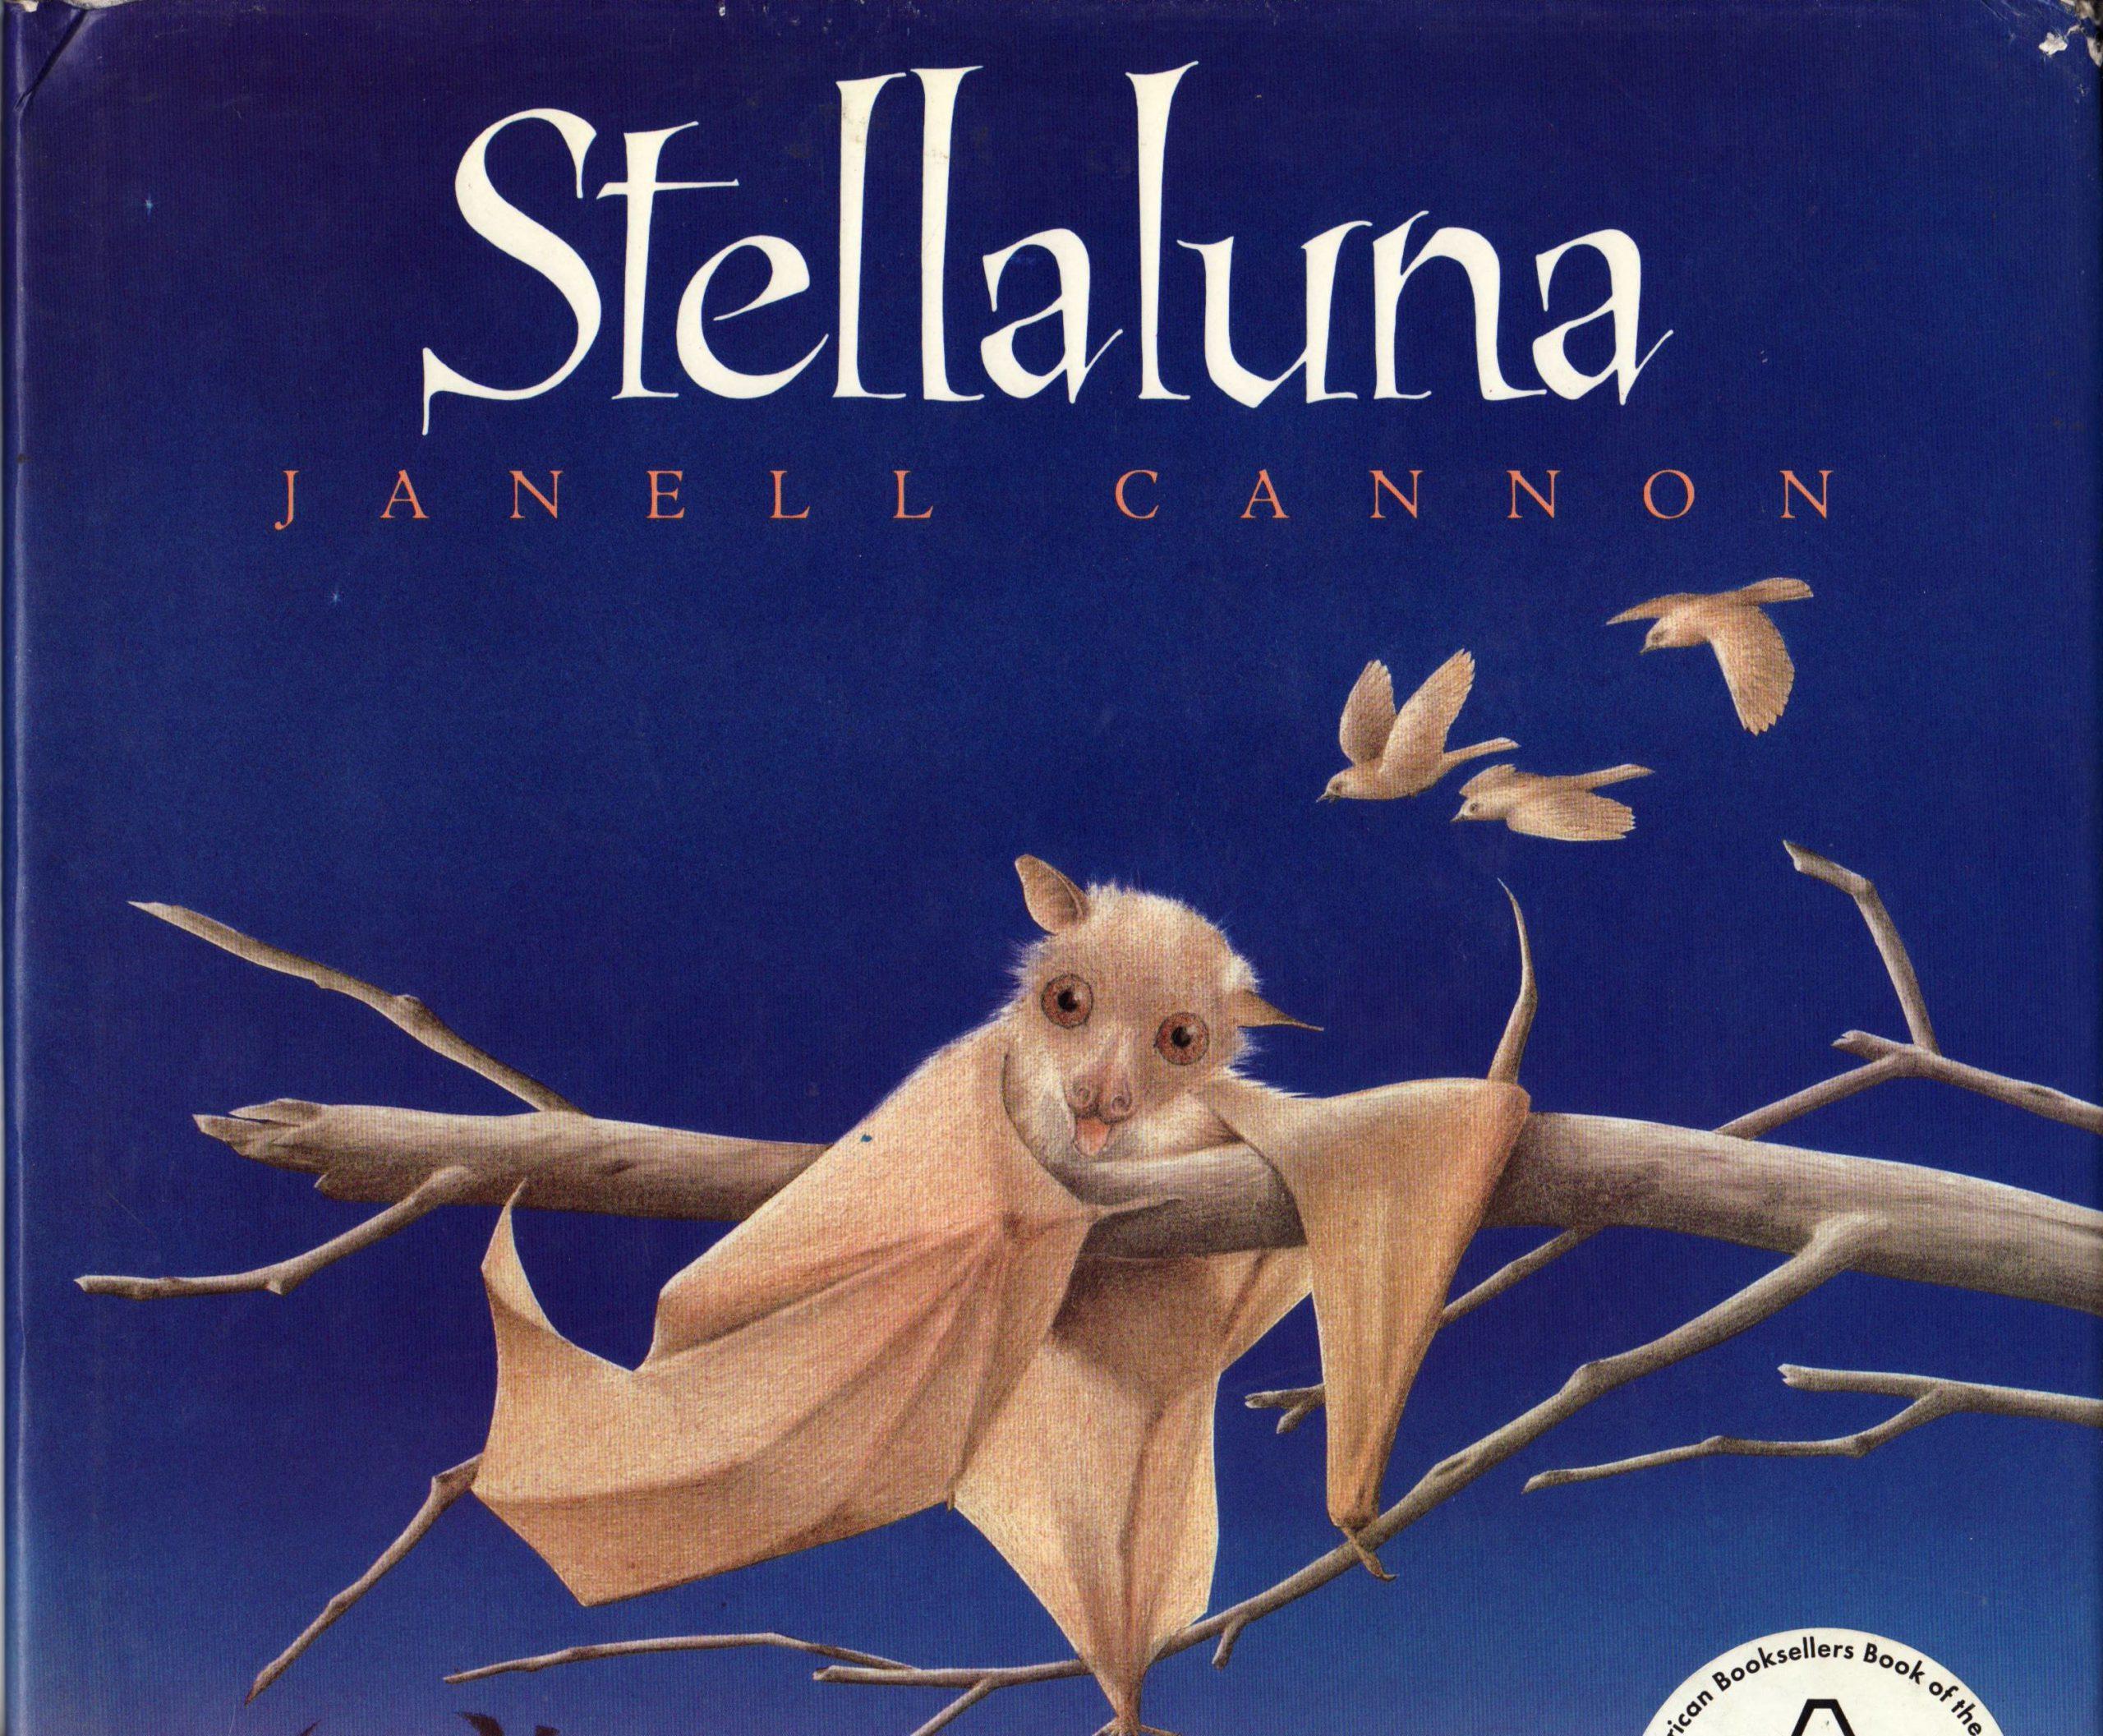 Stellaluna - Teaching Children Philosophy - Prindle Institute